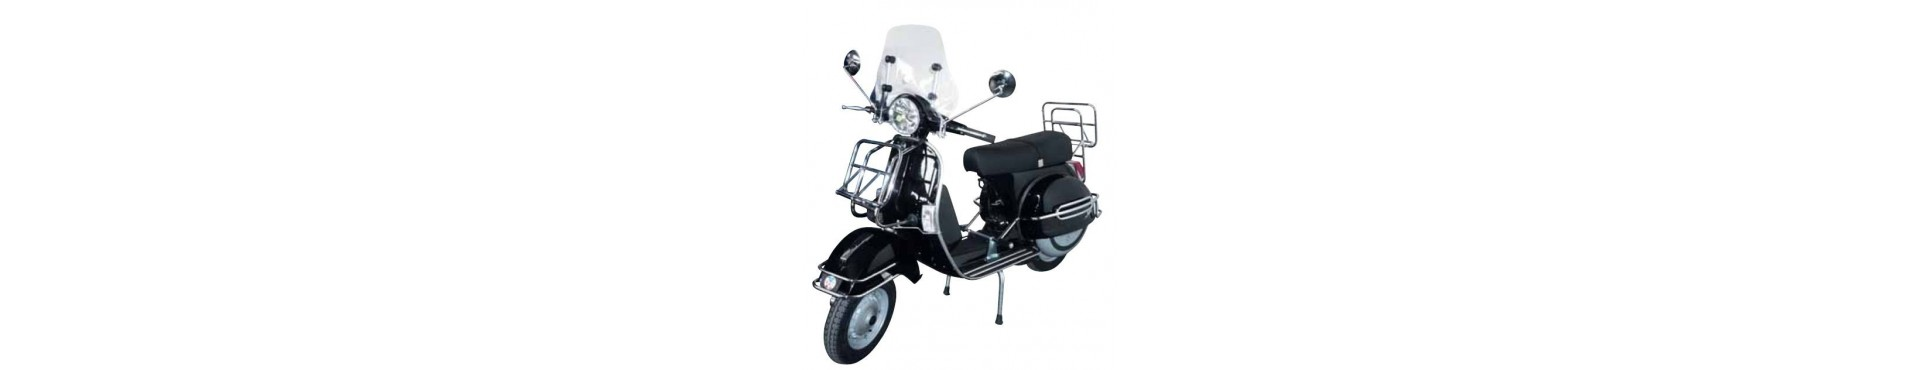 007.Accessori vari  Vespa shop by Best Motor